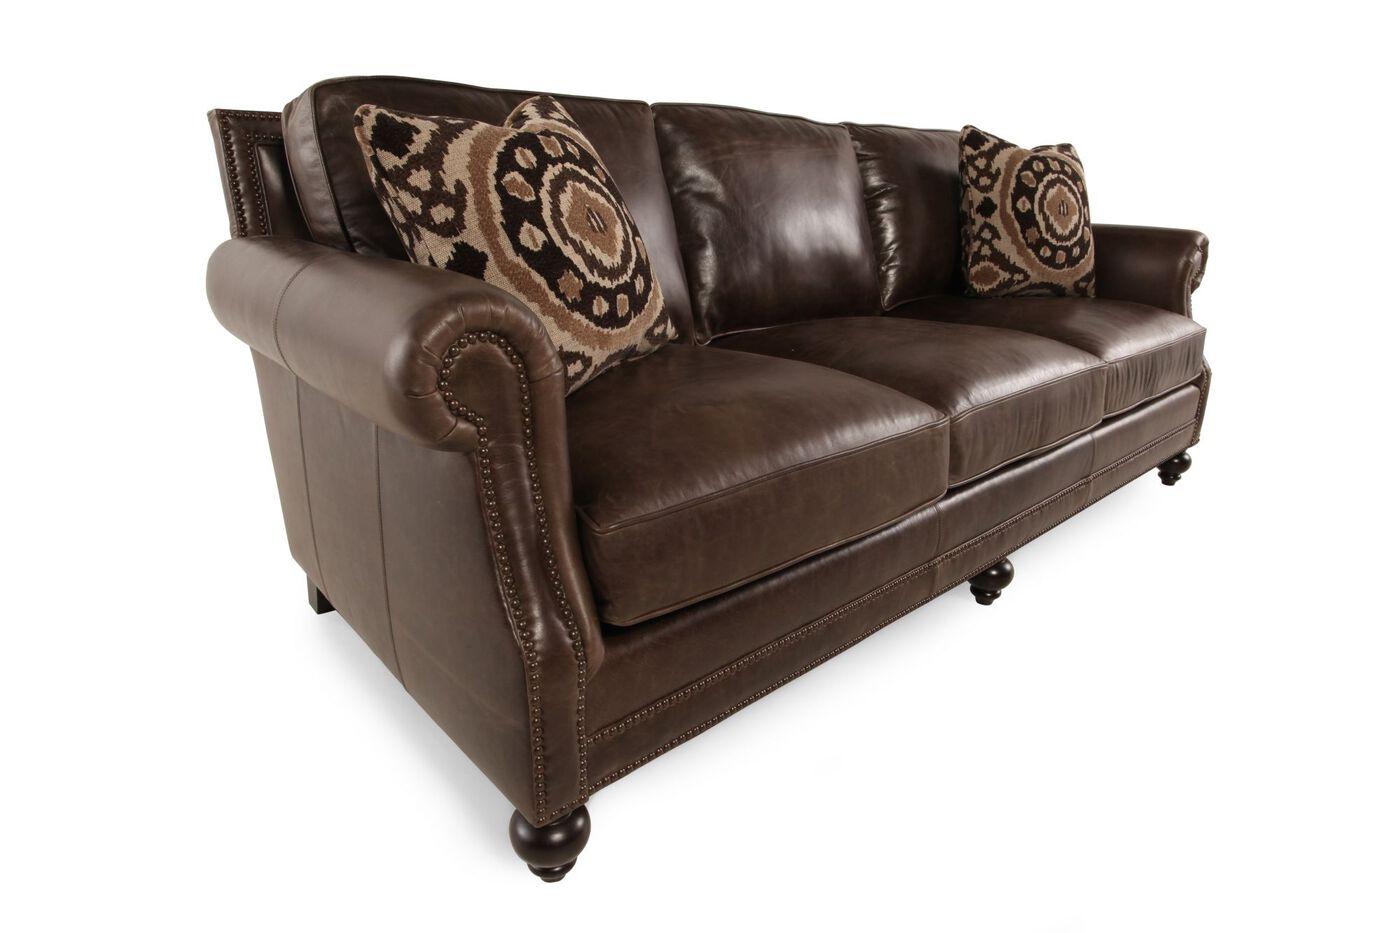 Bernhardt Brae Leather Sofa